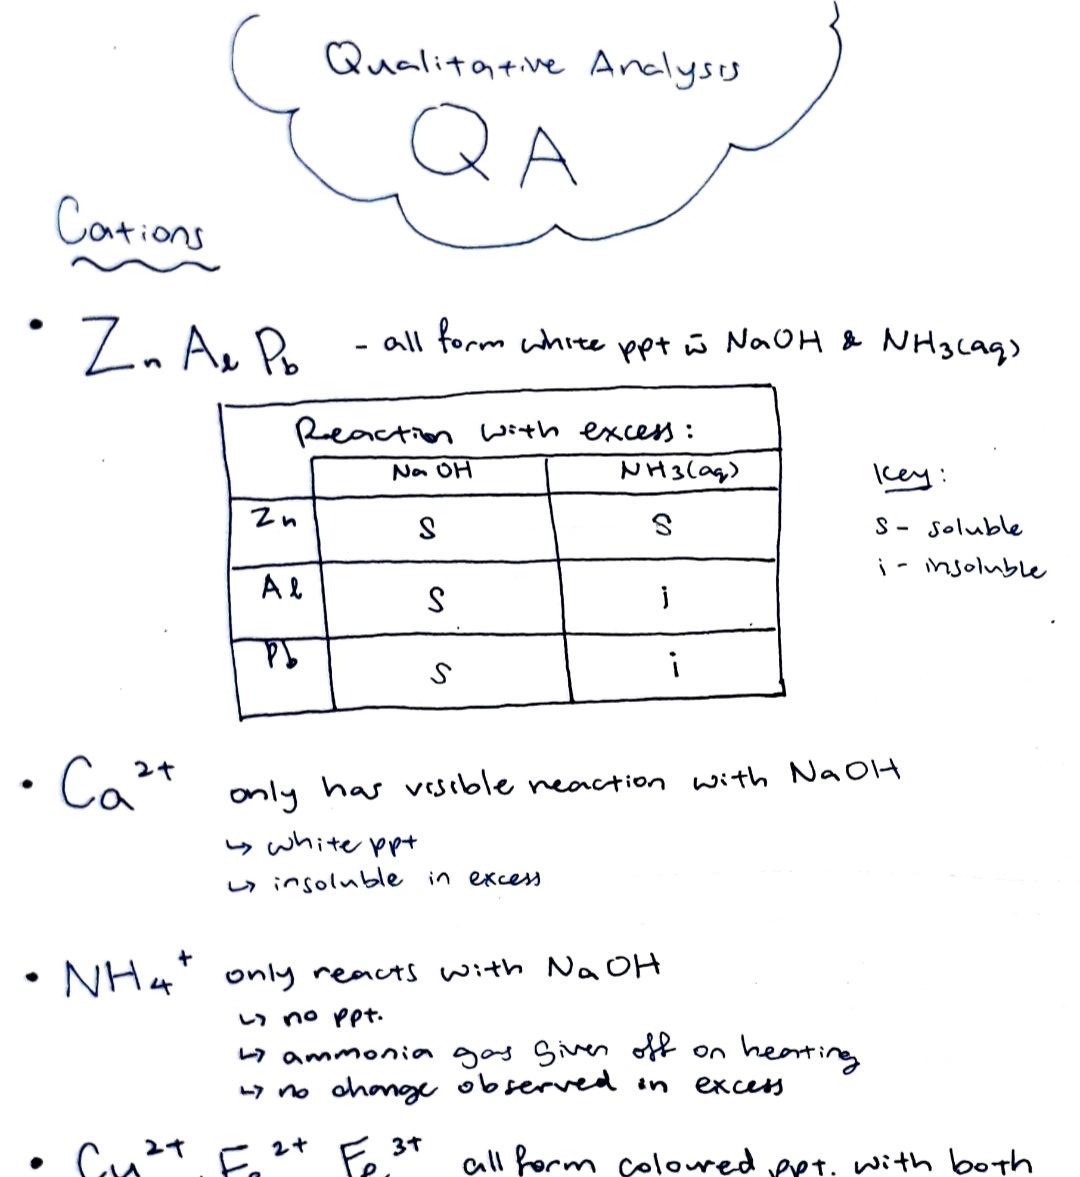 O Level Chemistry Qualitative Analysis Cheat Sheet